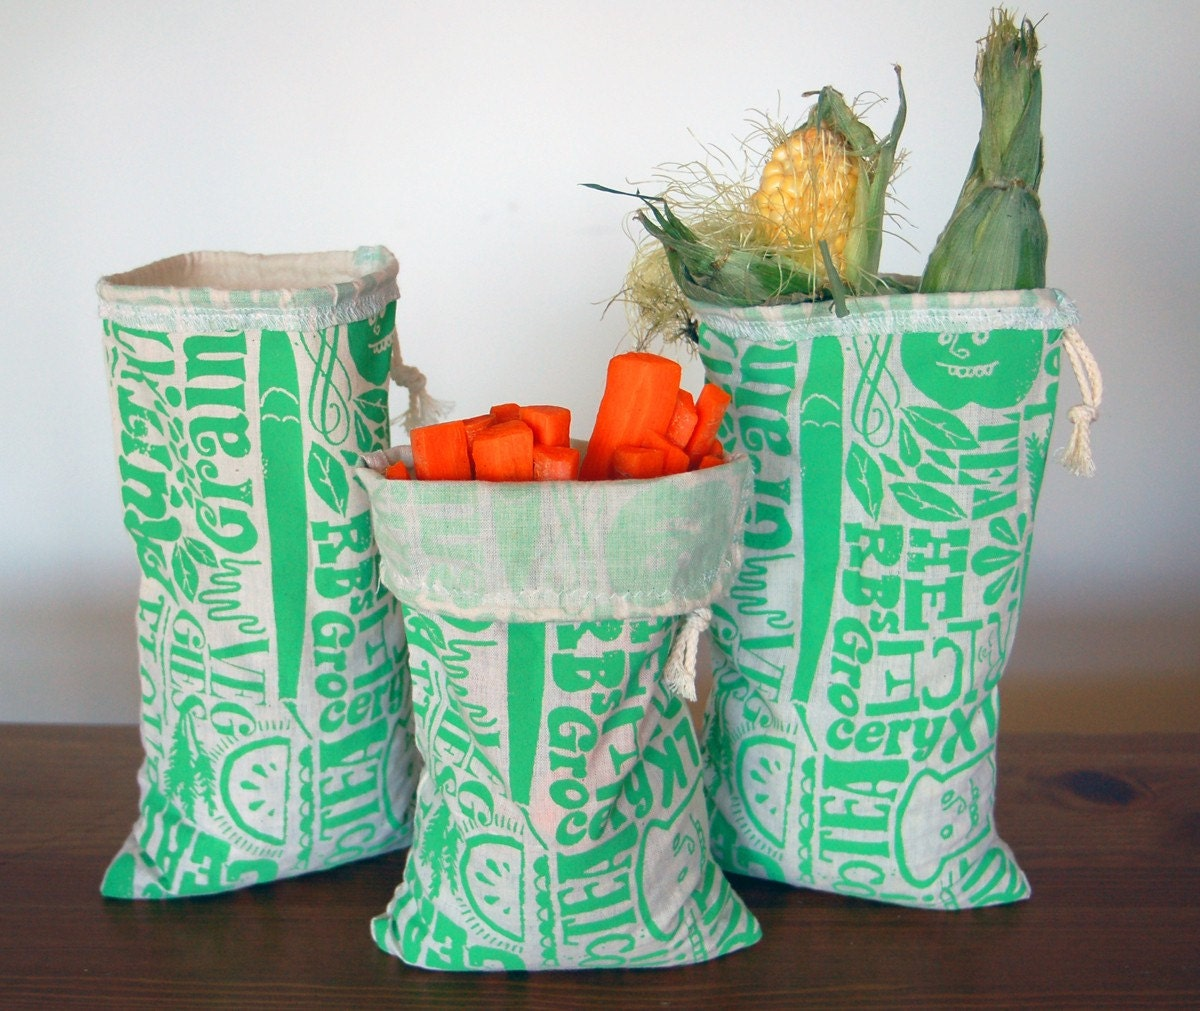 Single Medium Happy Reusable Vegetable Bags in Green